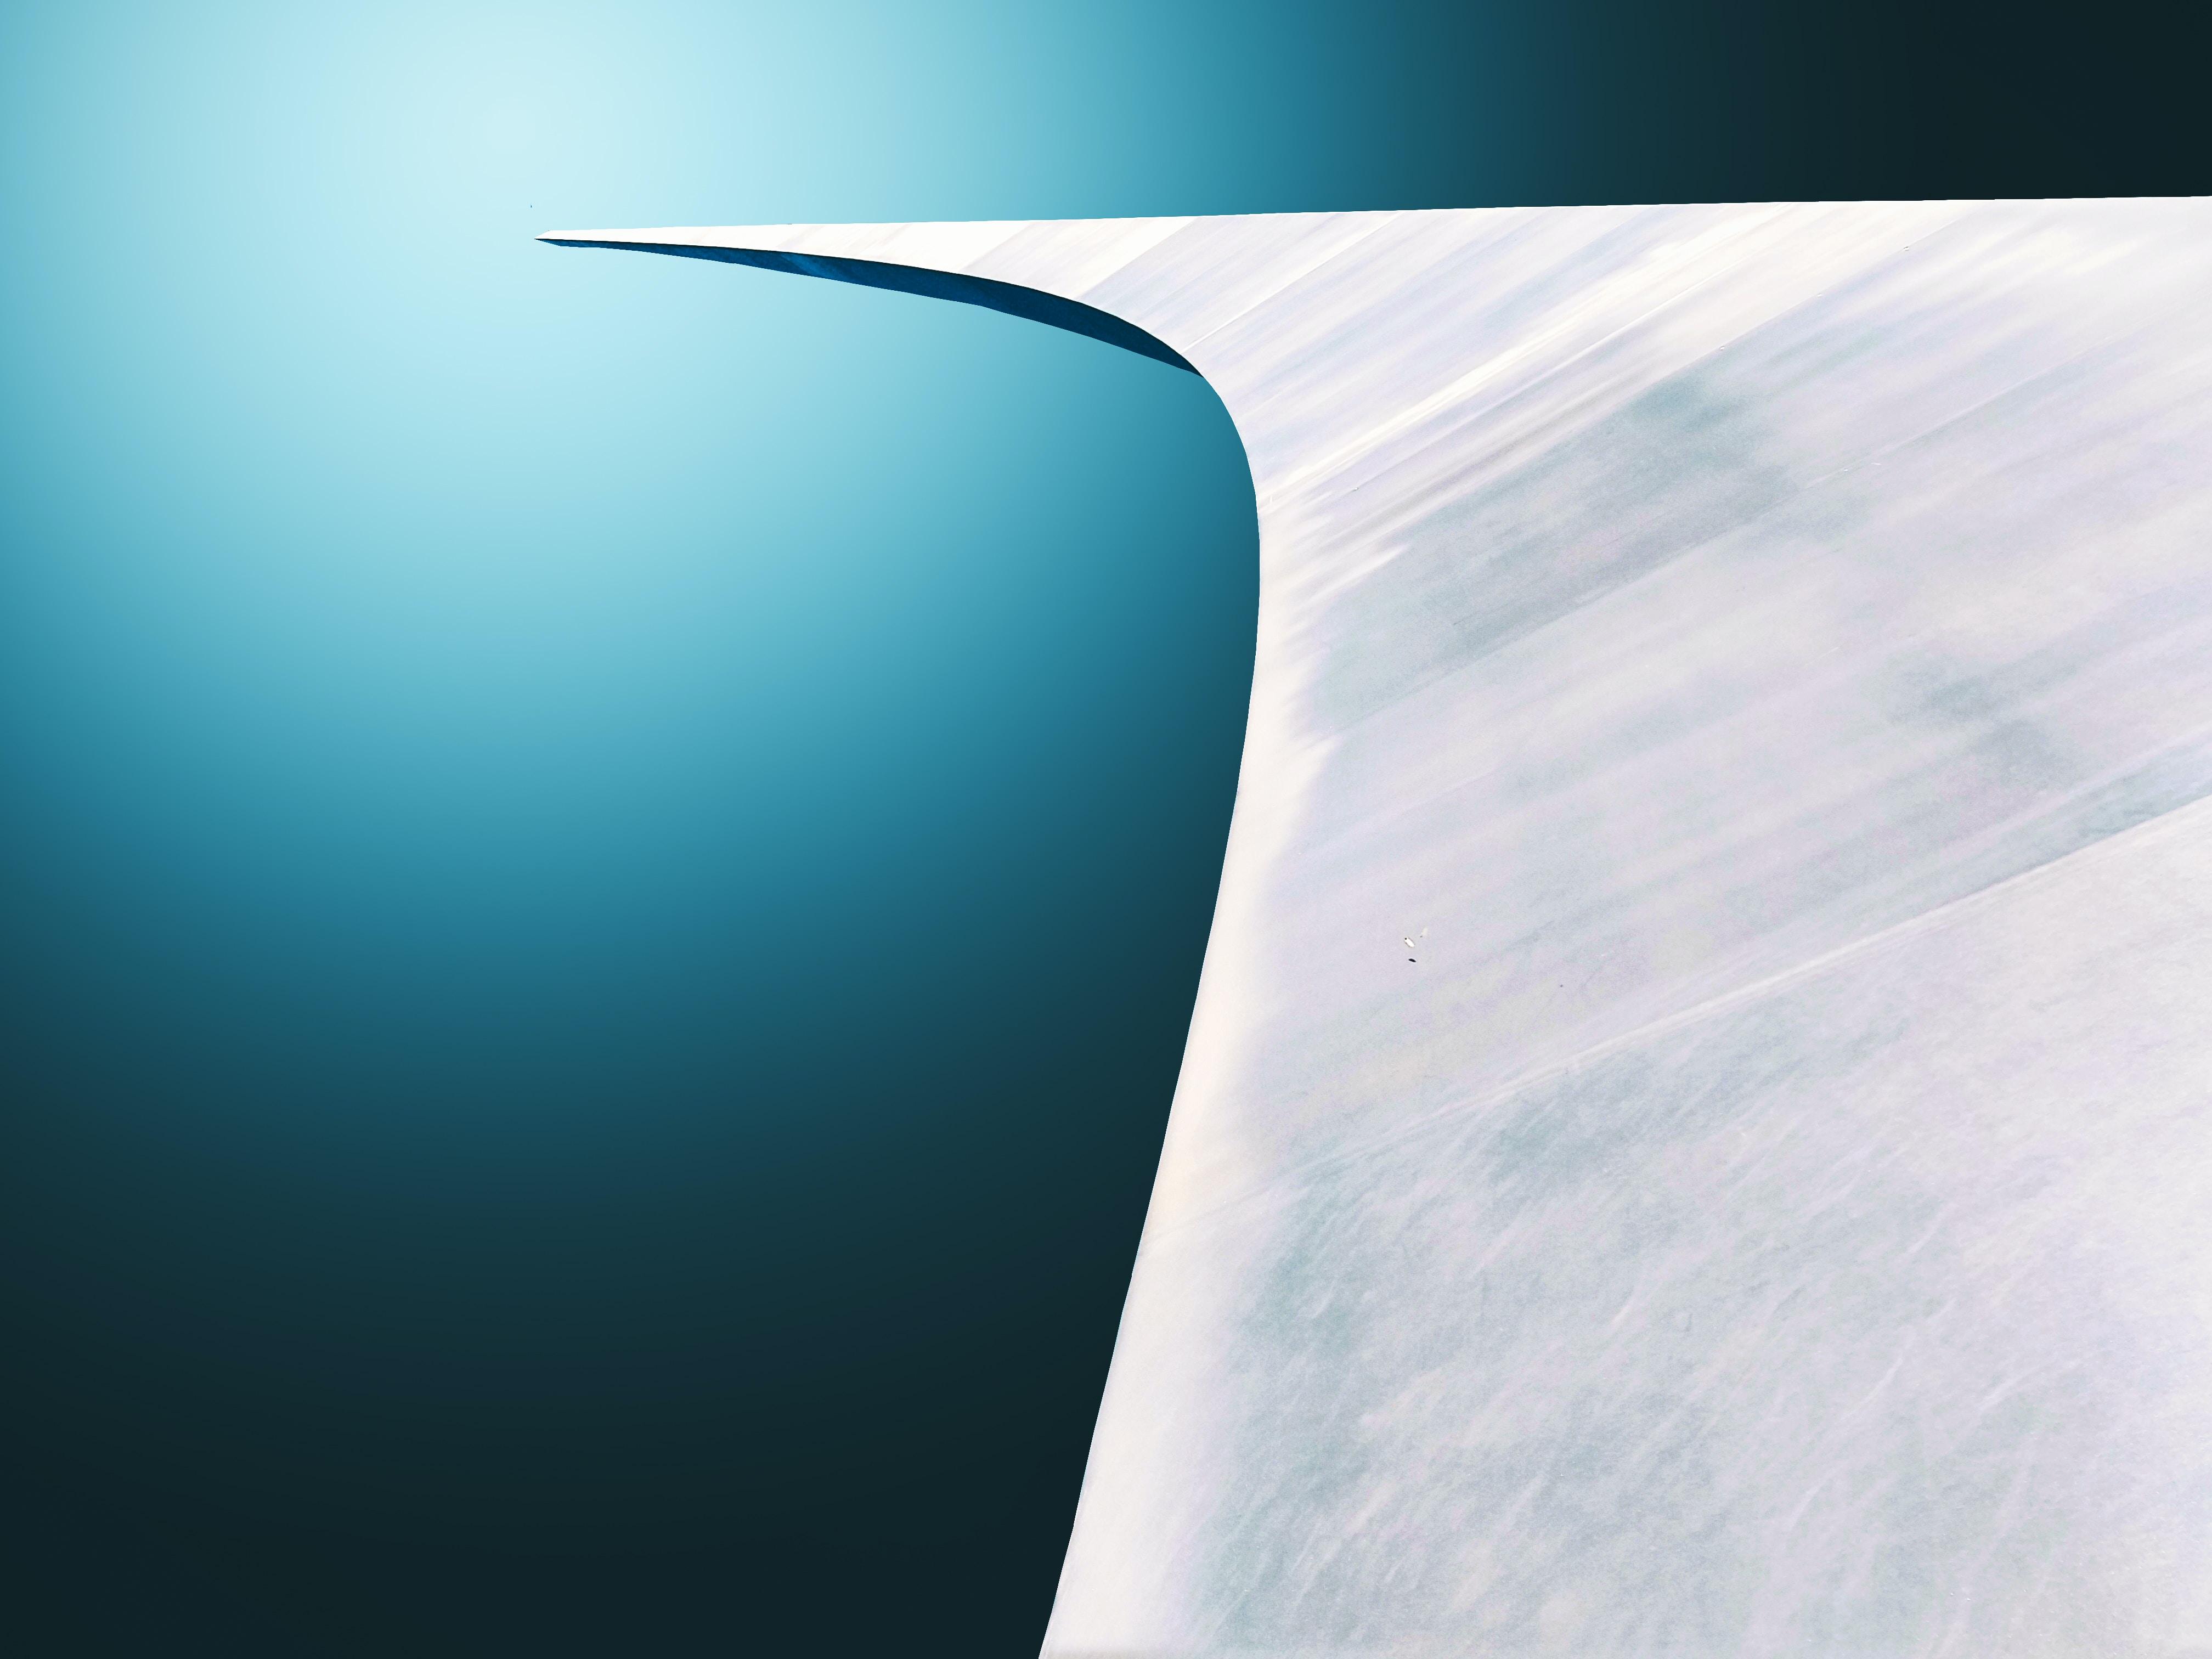 white surface illustration